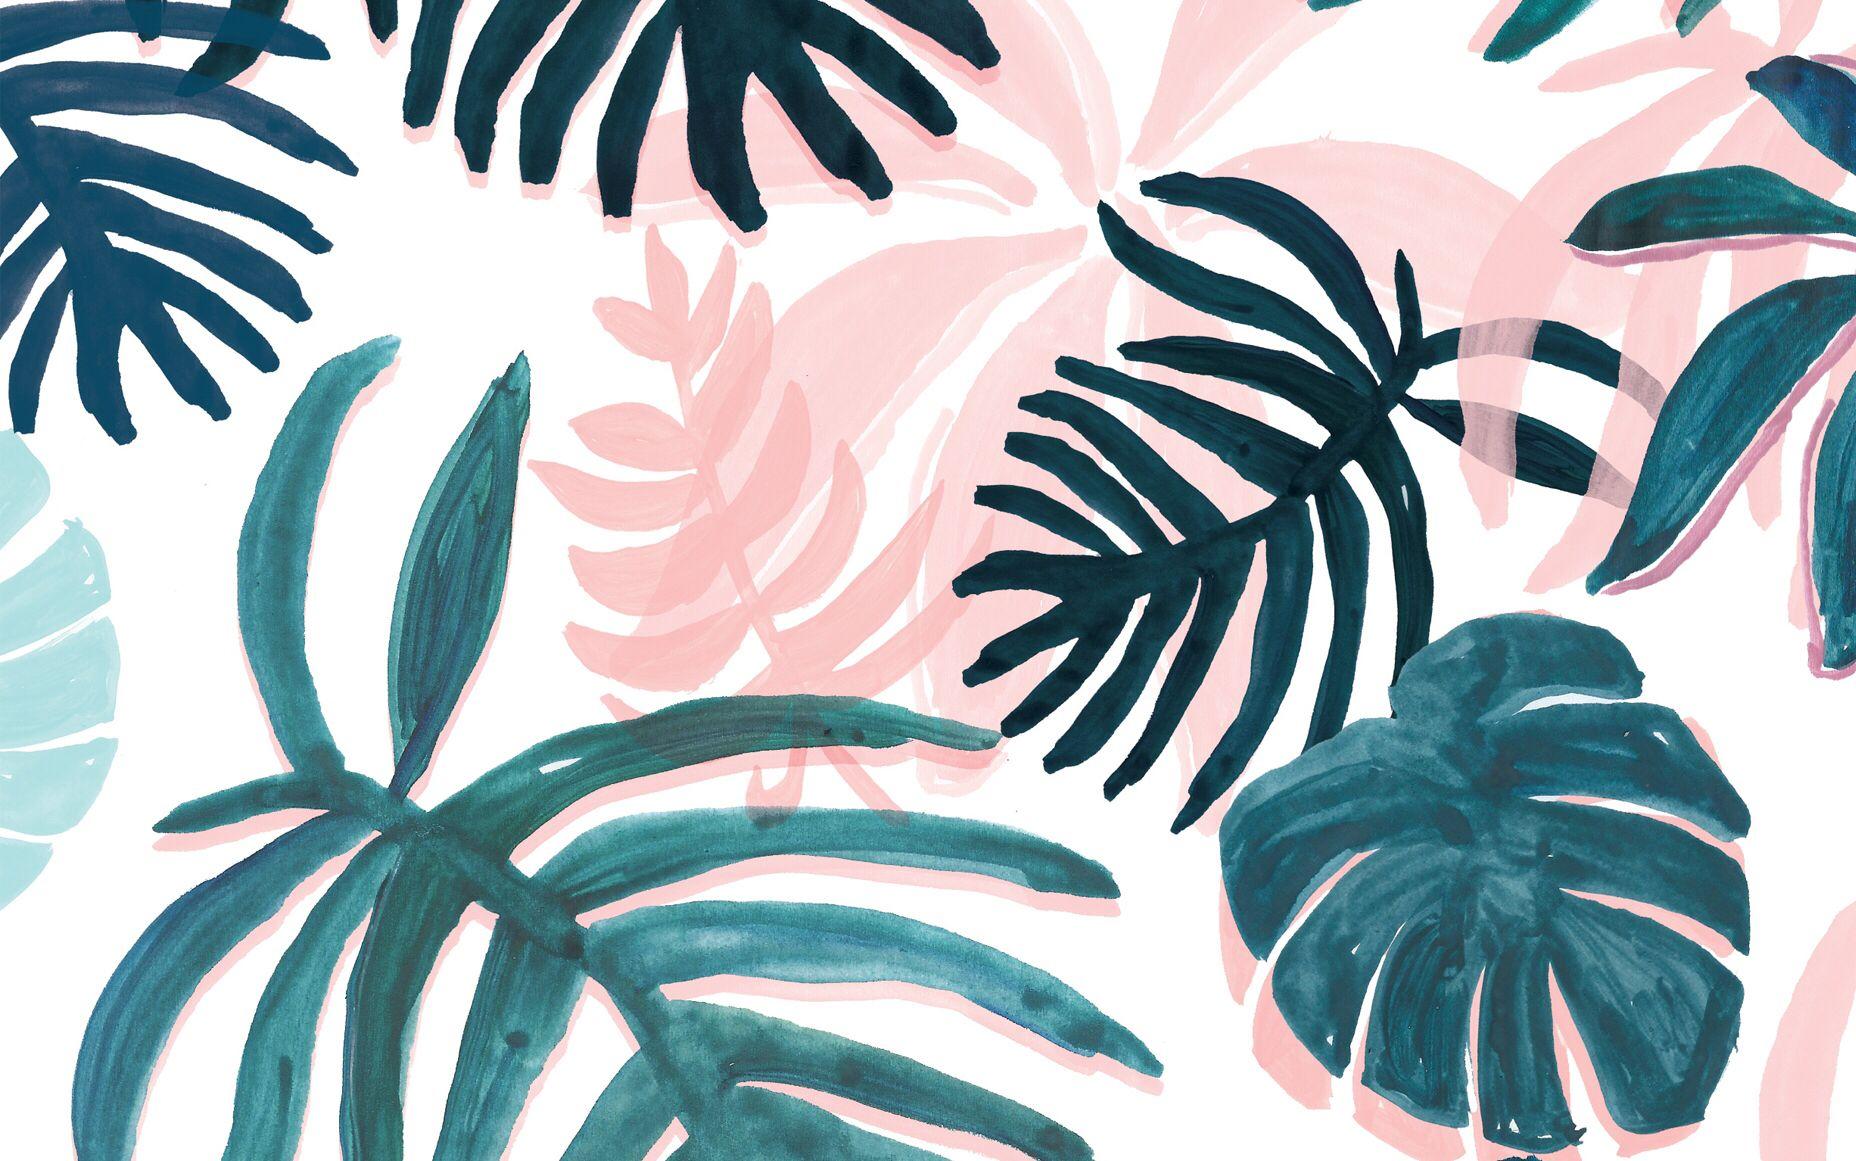 Pin by duaa on Autumn fashion Laptop wallpaper, Desktop